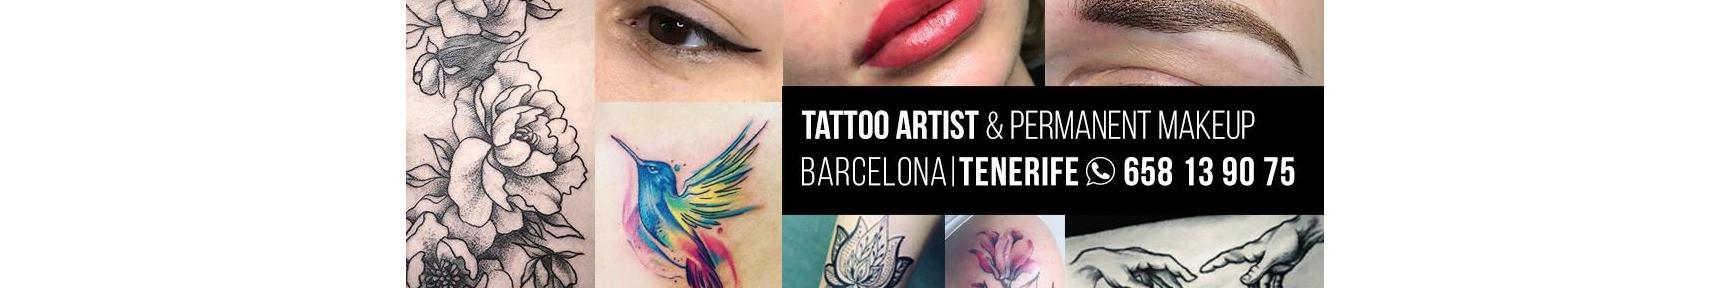 Darina Tattoo Art and Permanent MakeUp